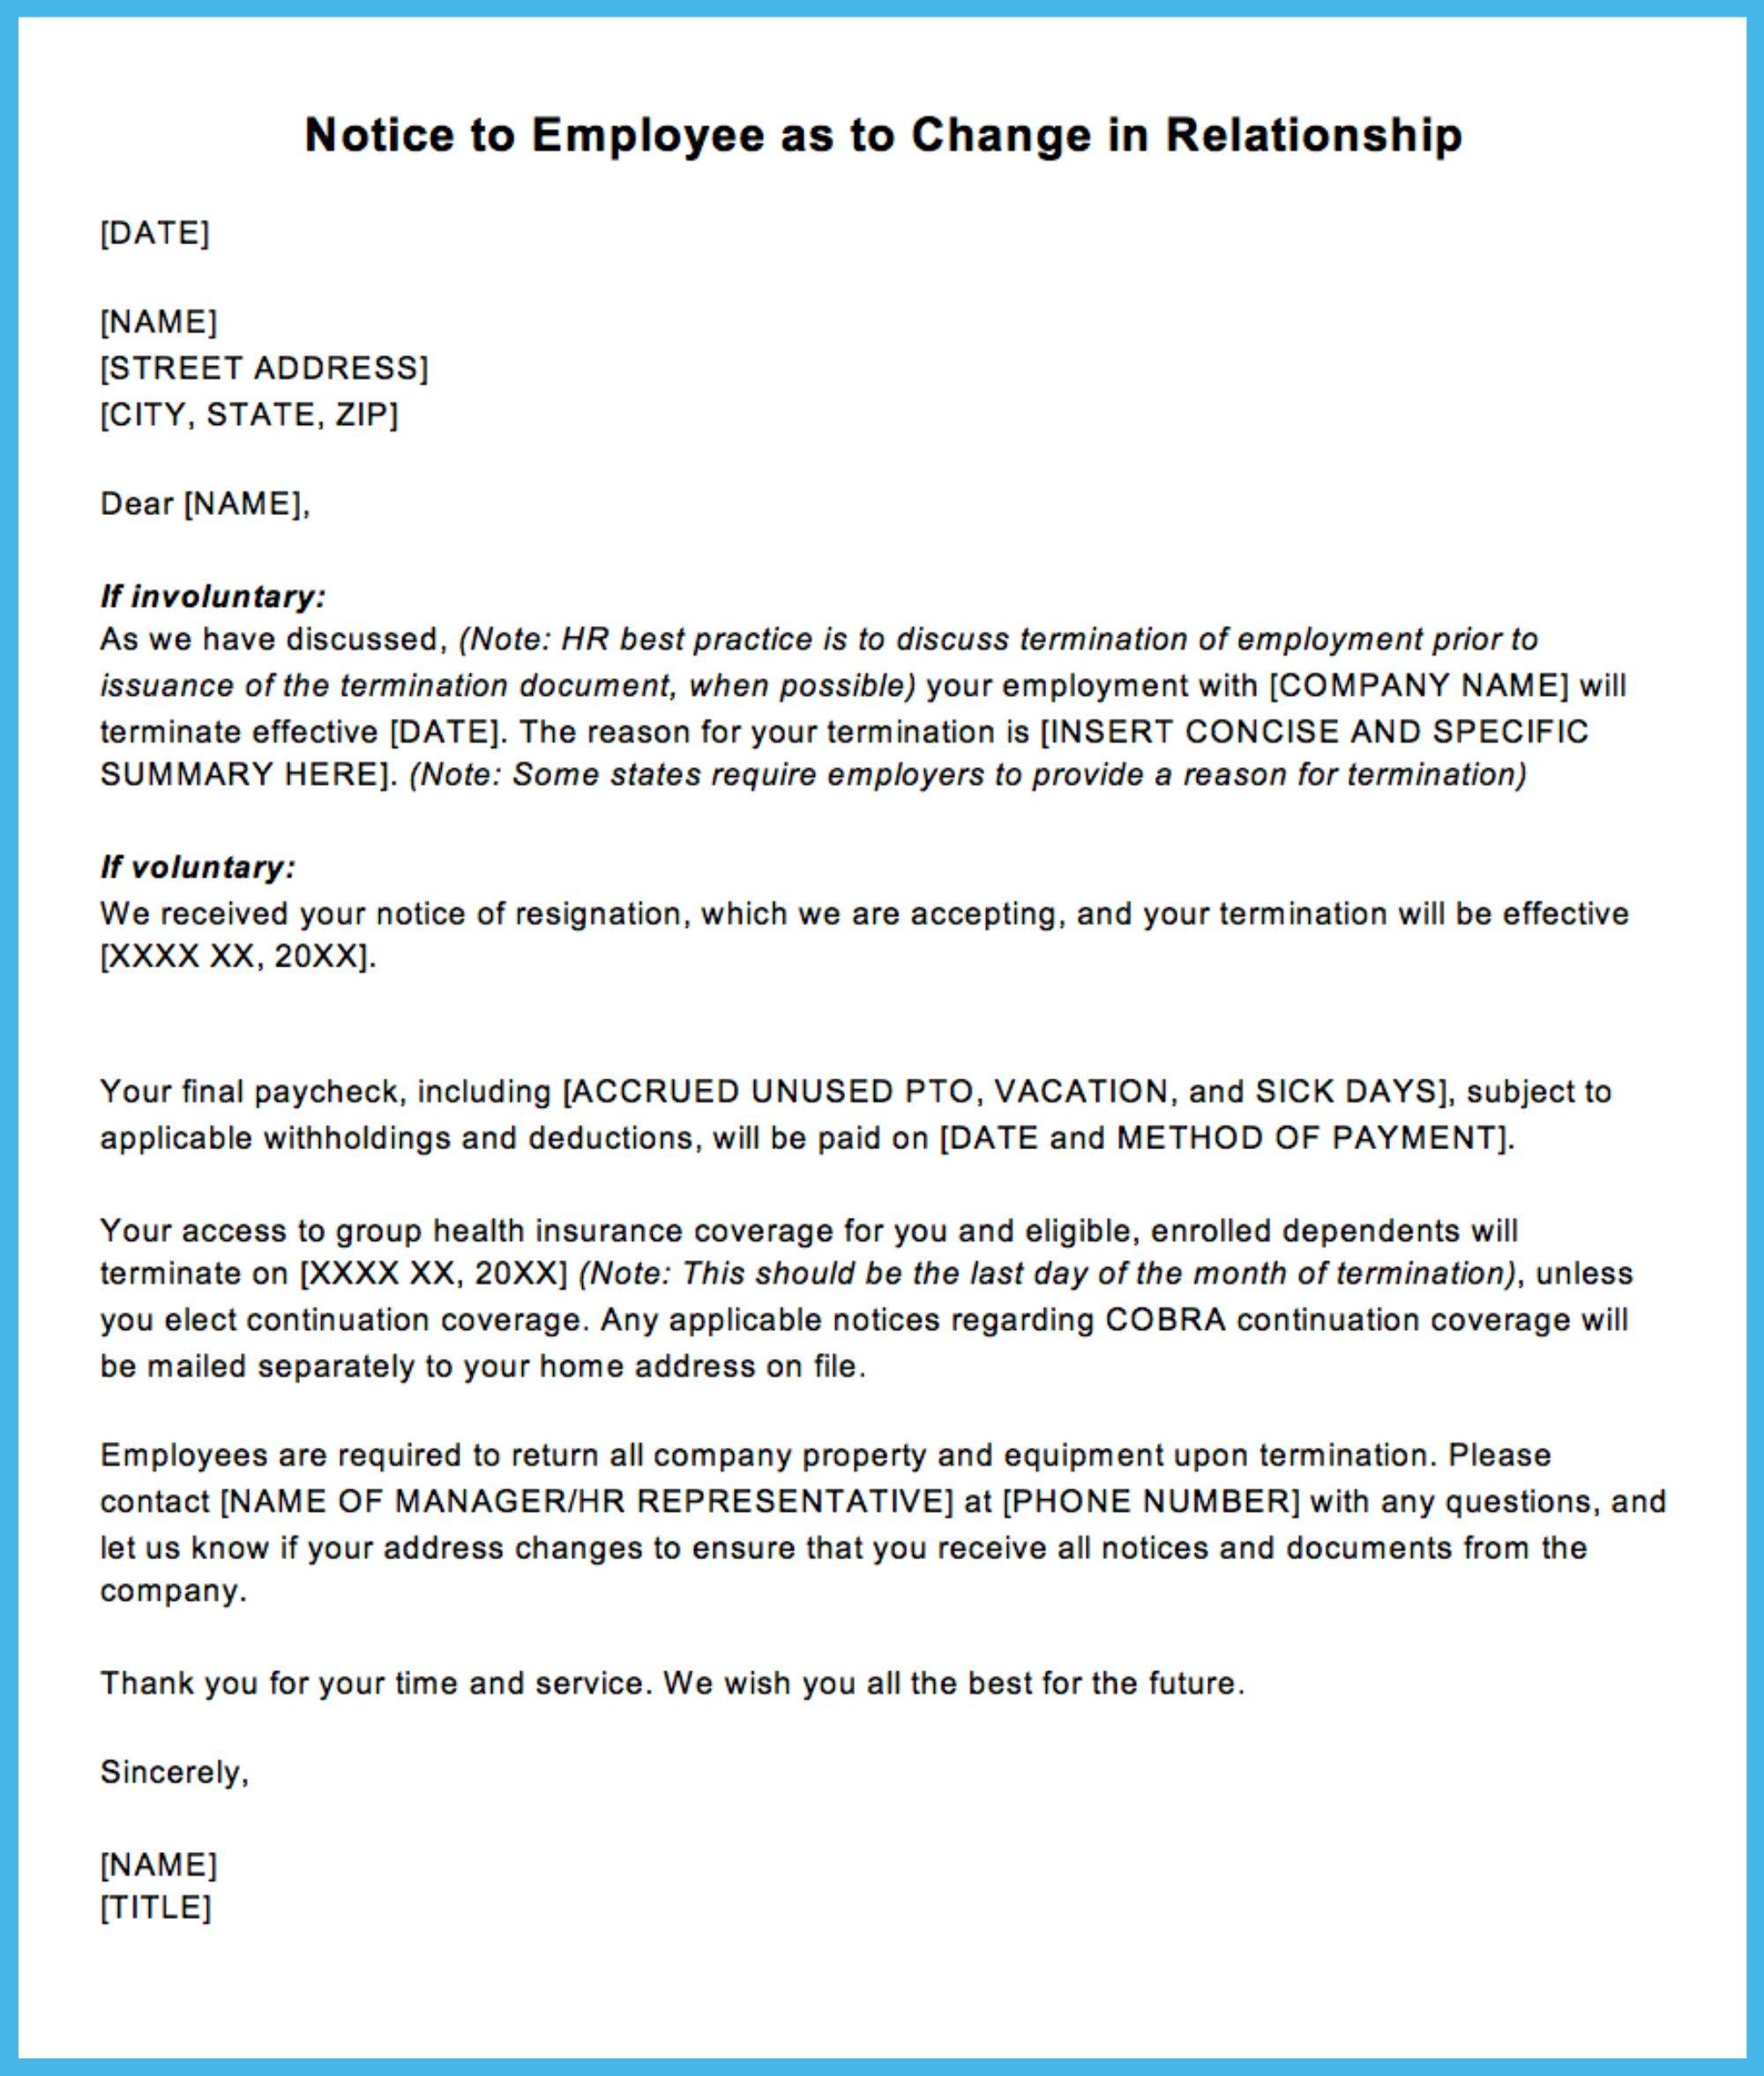 Sample Termination Letter Letter Templates Simple Cover Letter Template Resignation Letter Sample